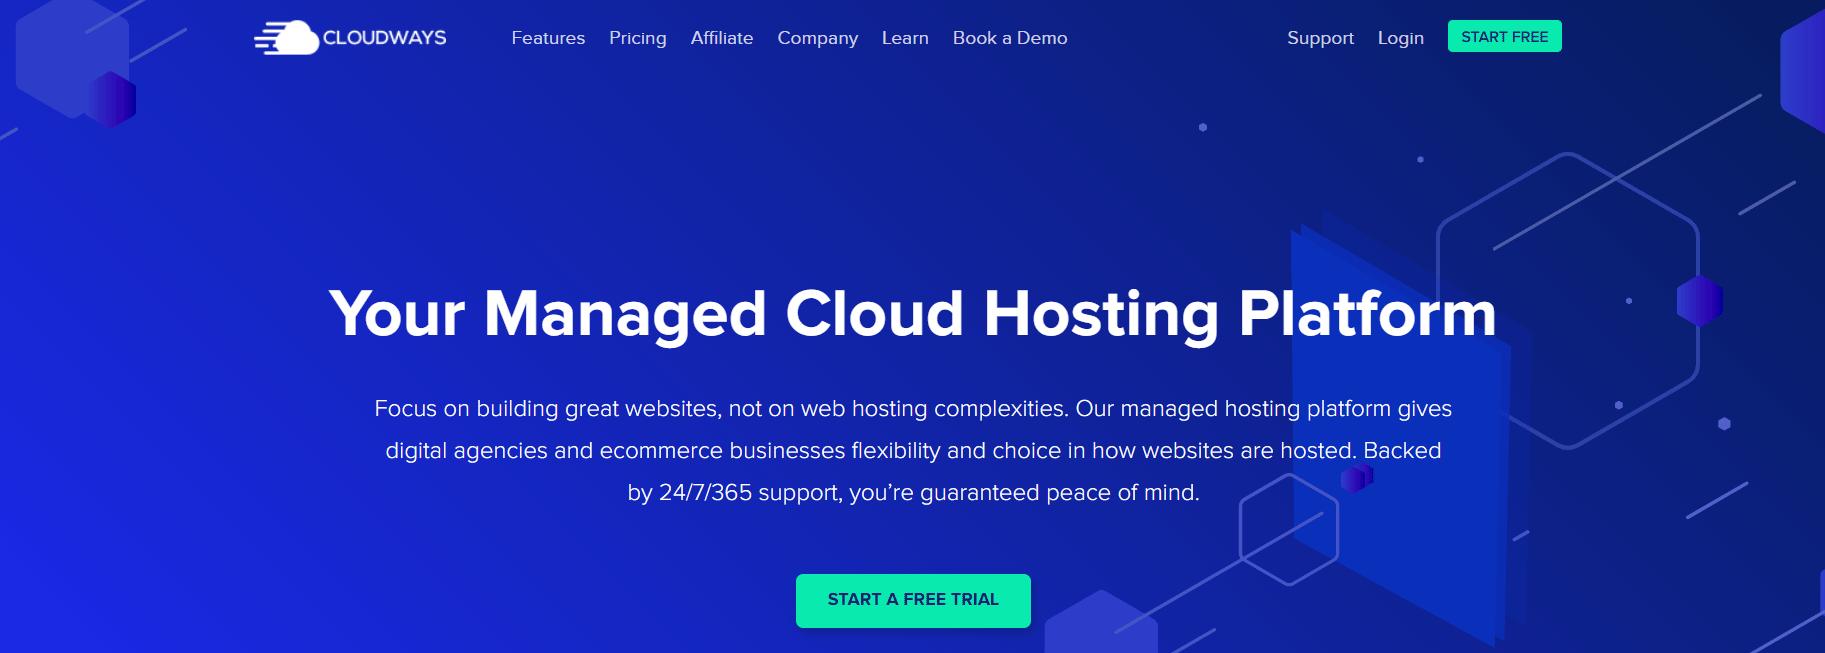 Cloudways主页。